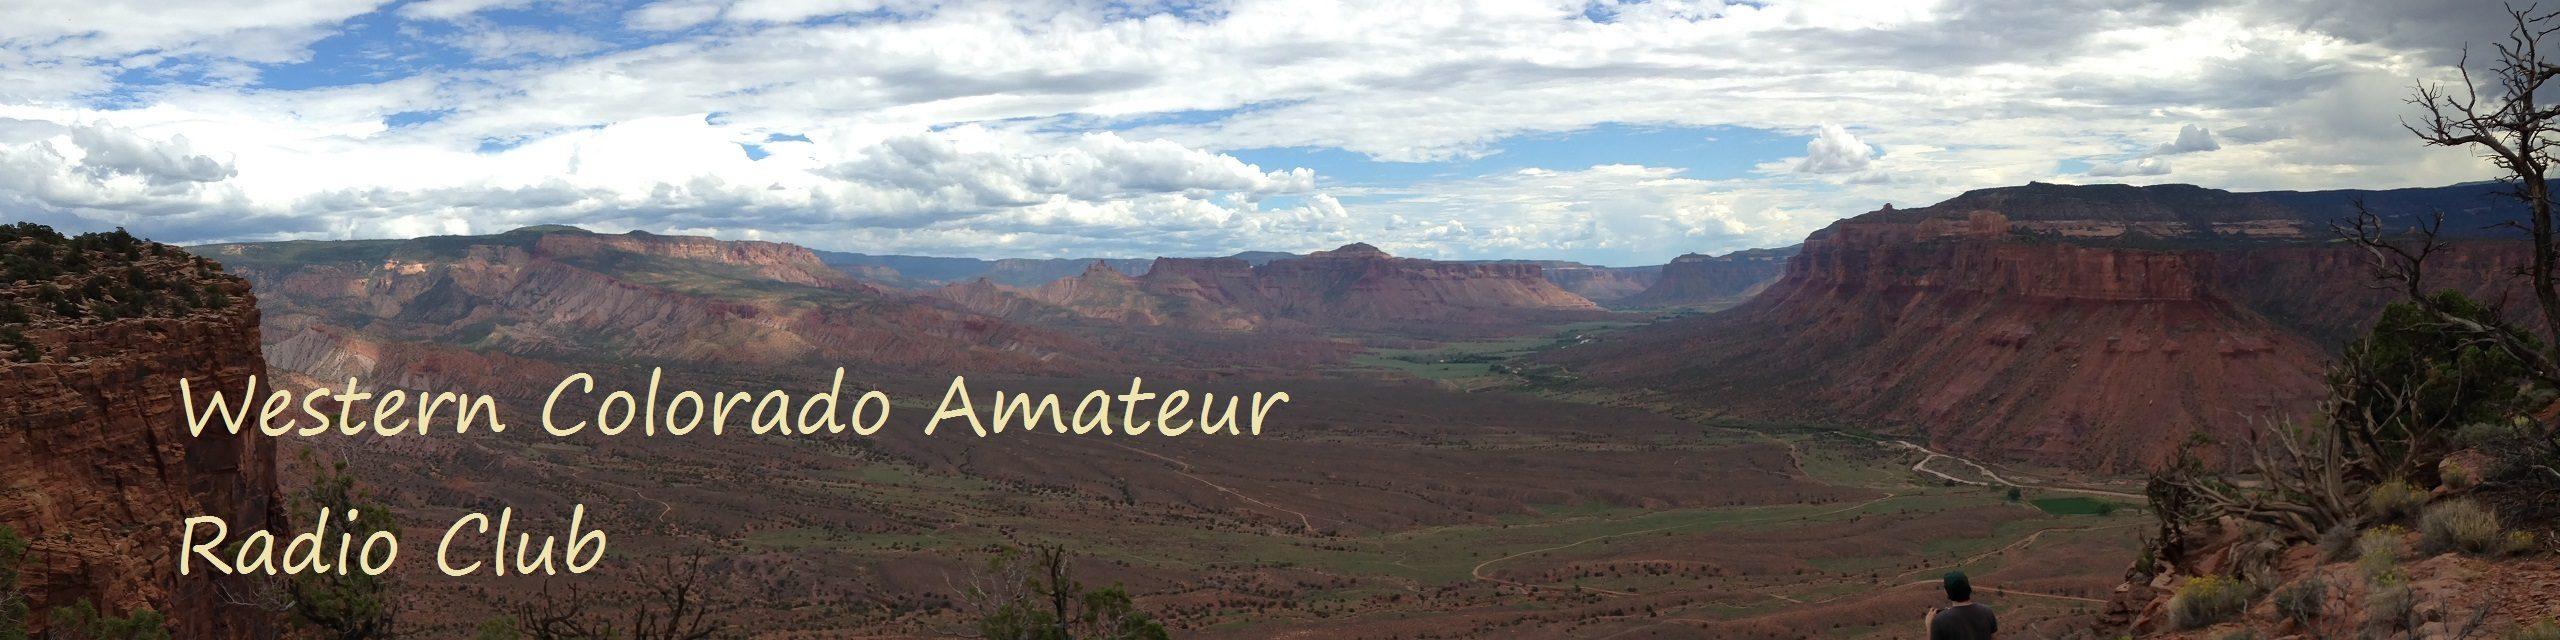 Western Colorado Amateur Radio Club